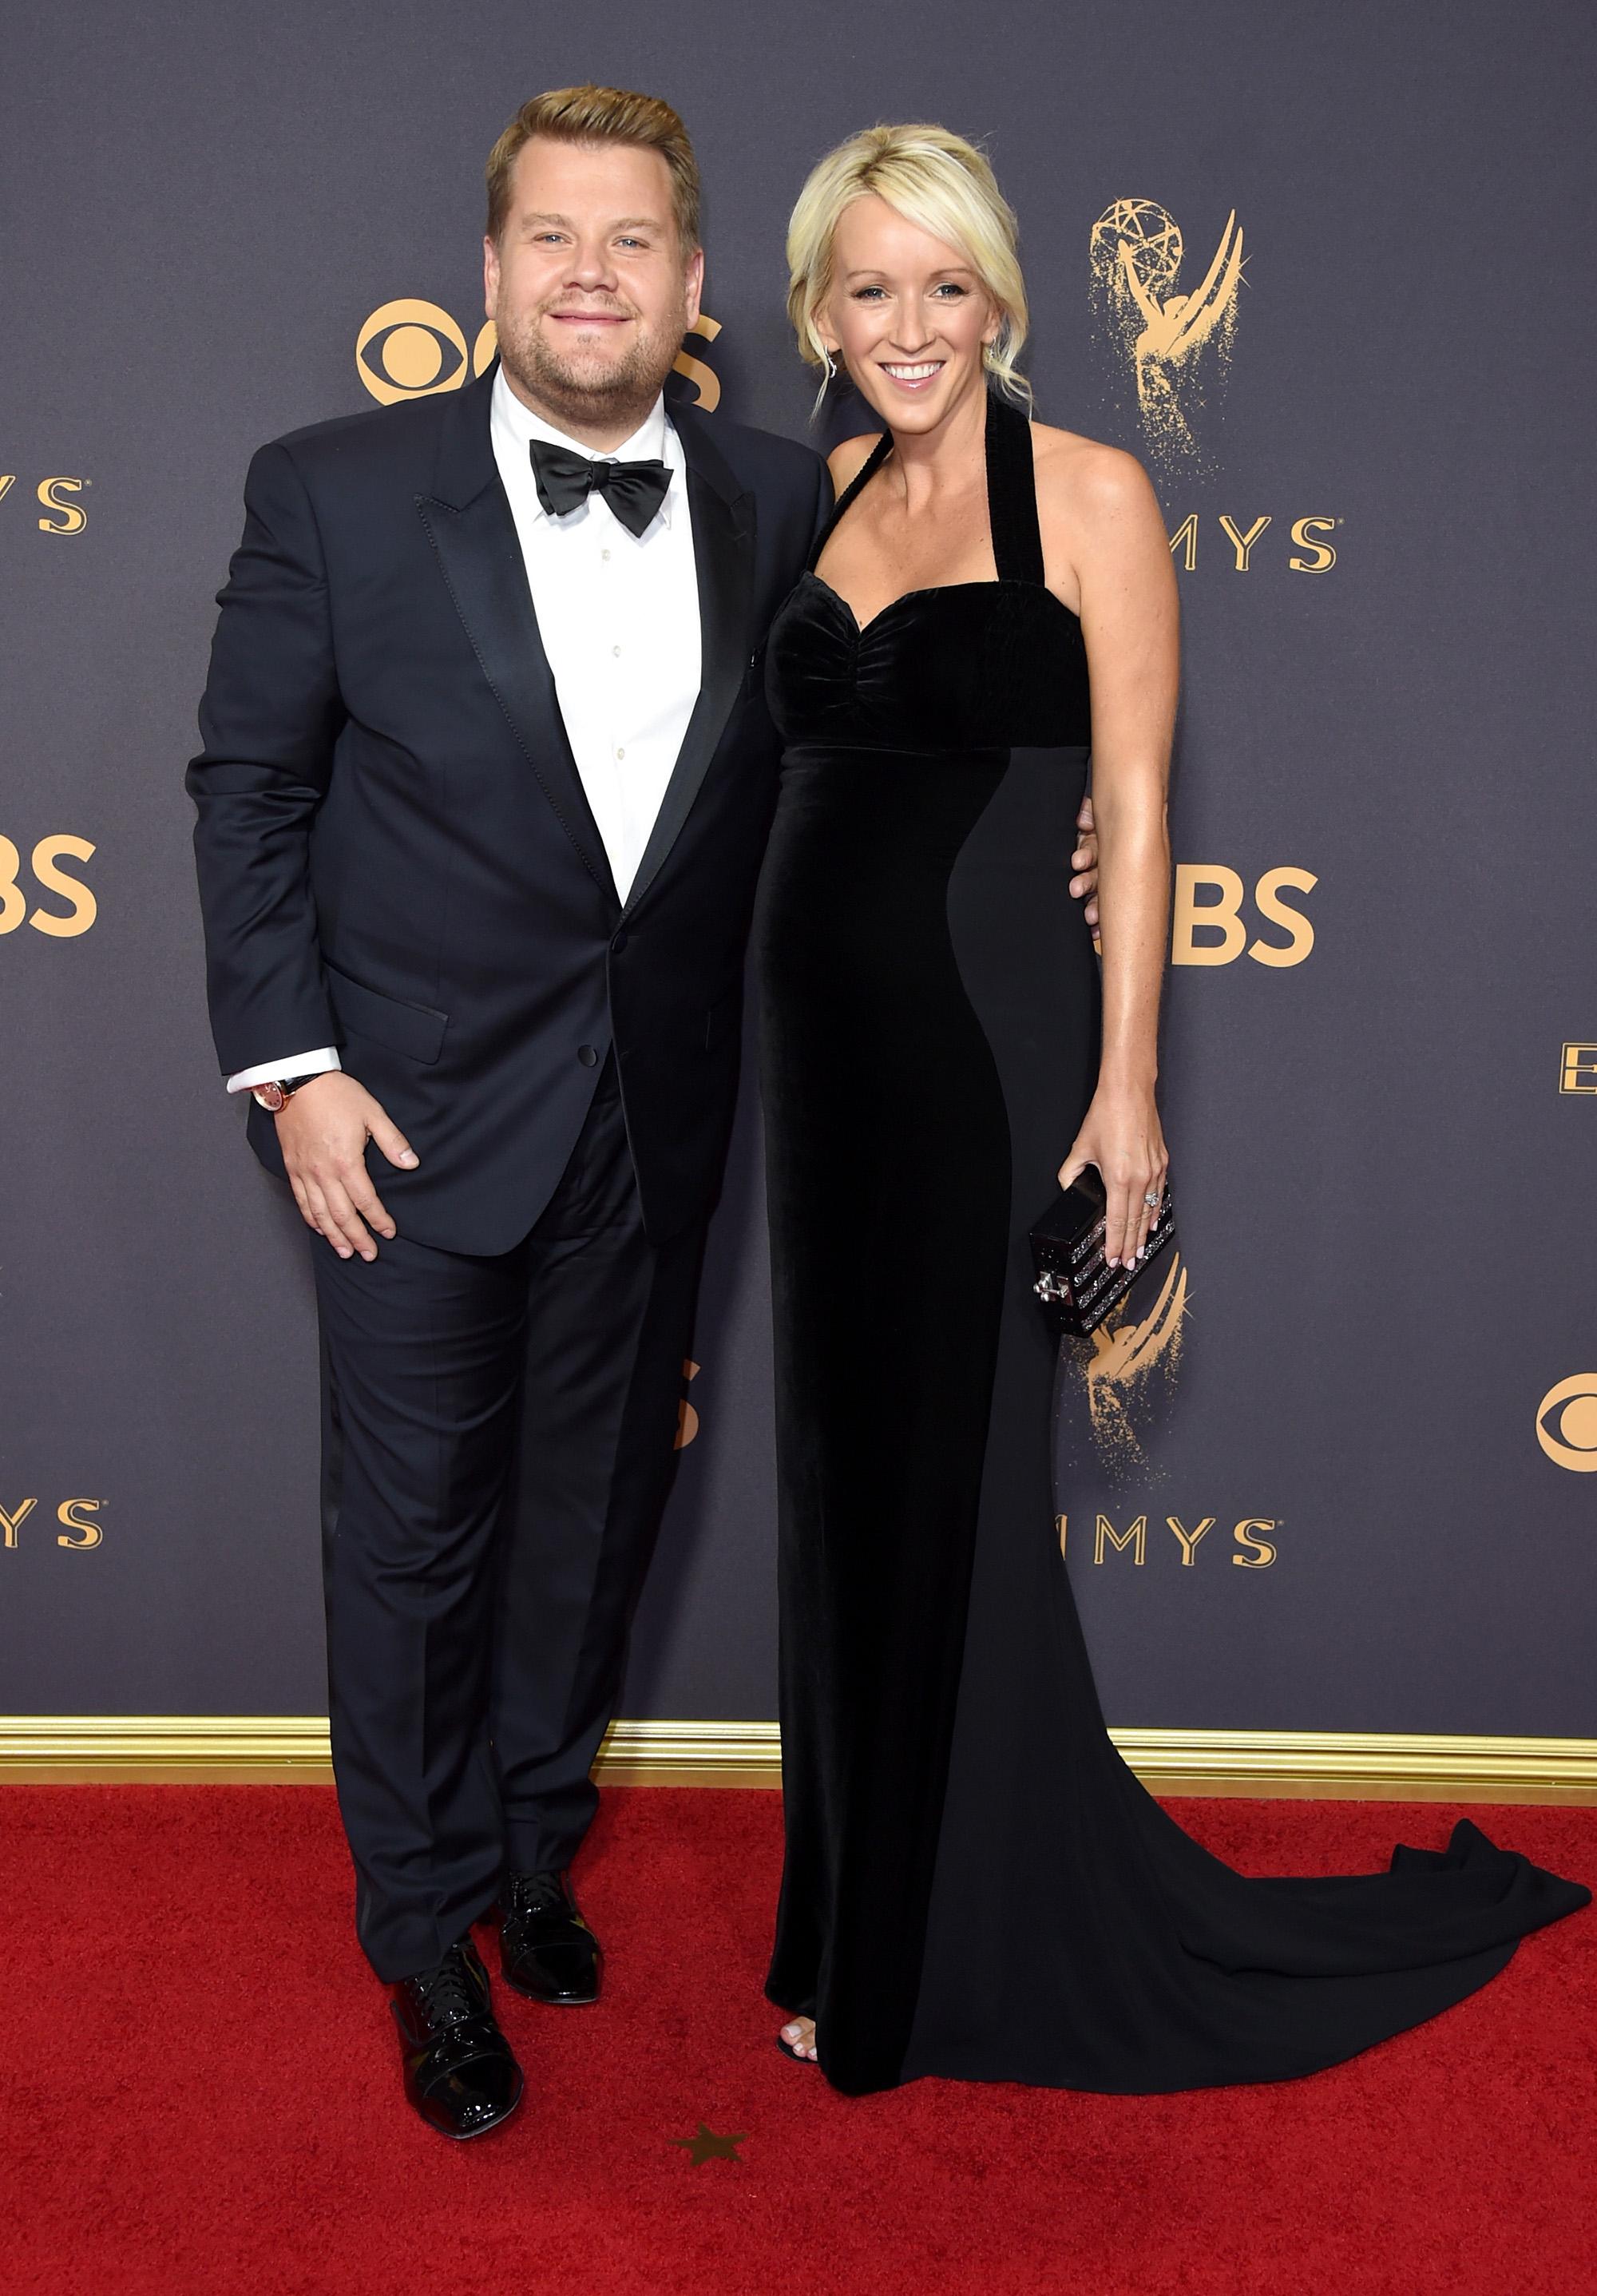 James Corden and Julia Carey Emmys 2017